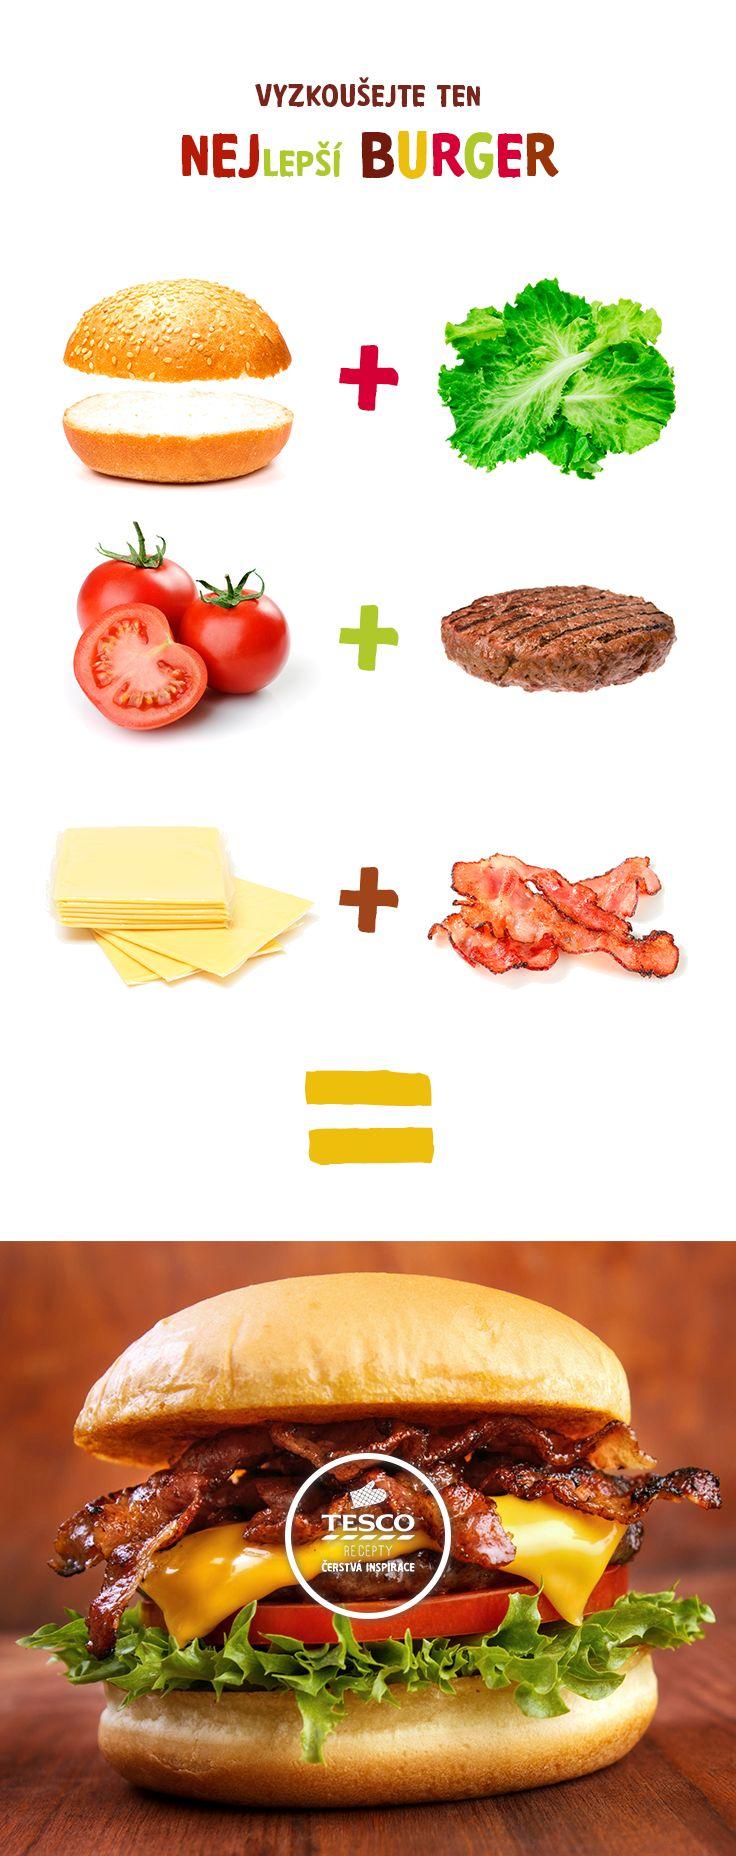 Vyzkoušejte výborný grilovaný cheeseburger! ;-)